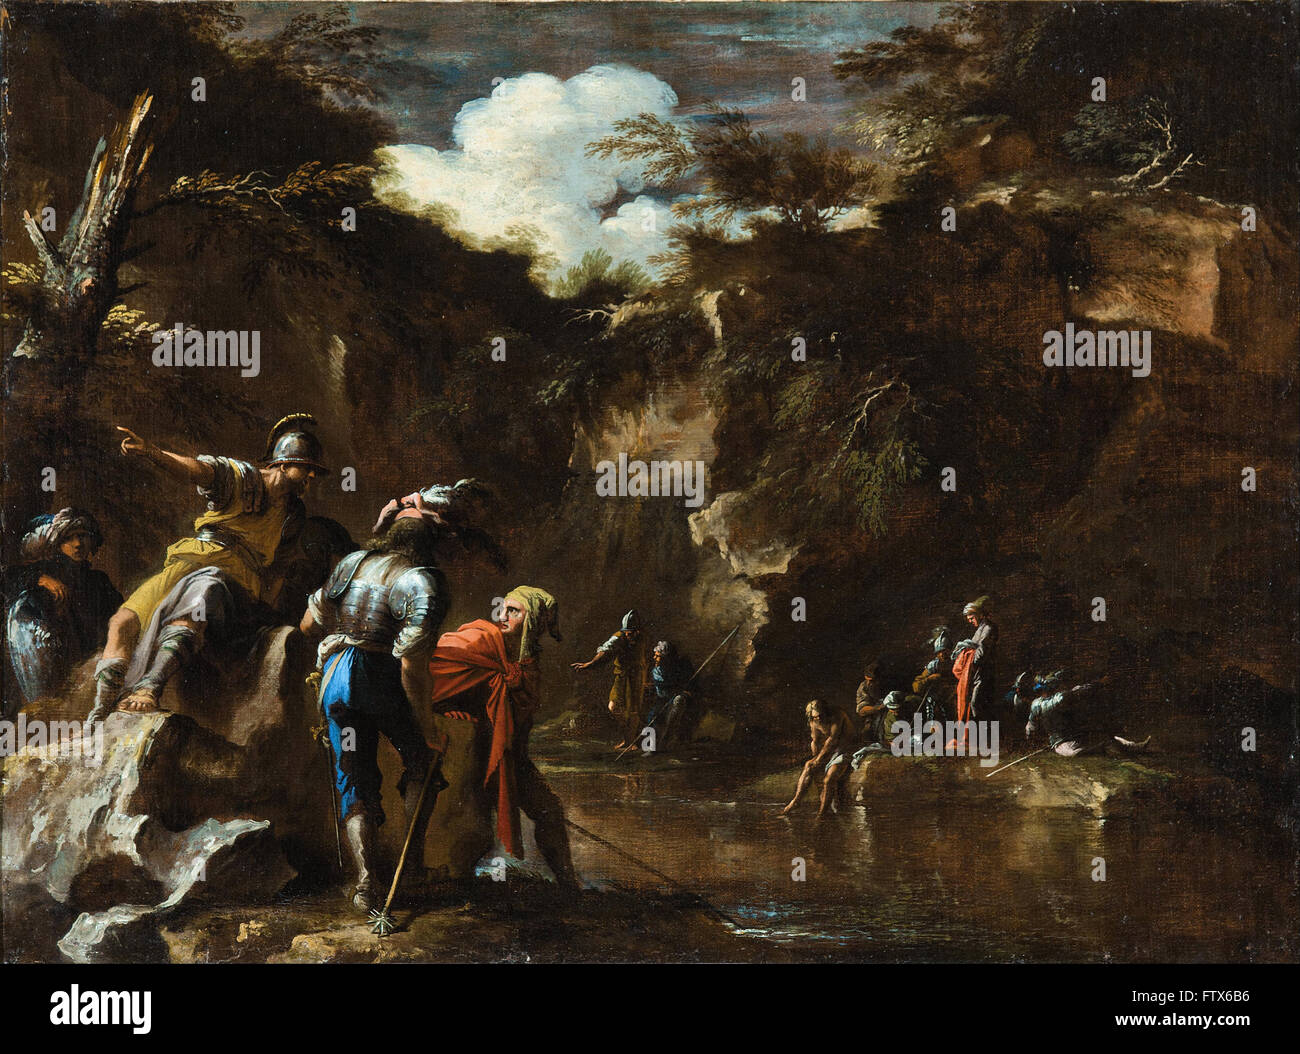 Salvator Rosa - Szene aus der griechischen Geschichte Stockbild